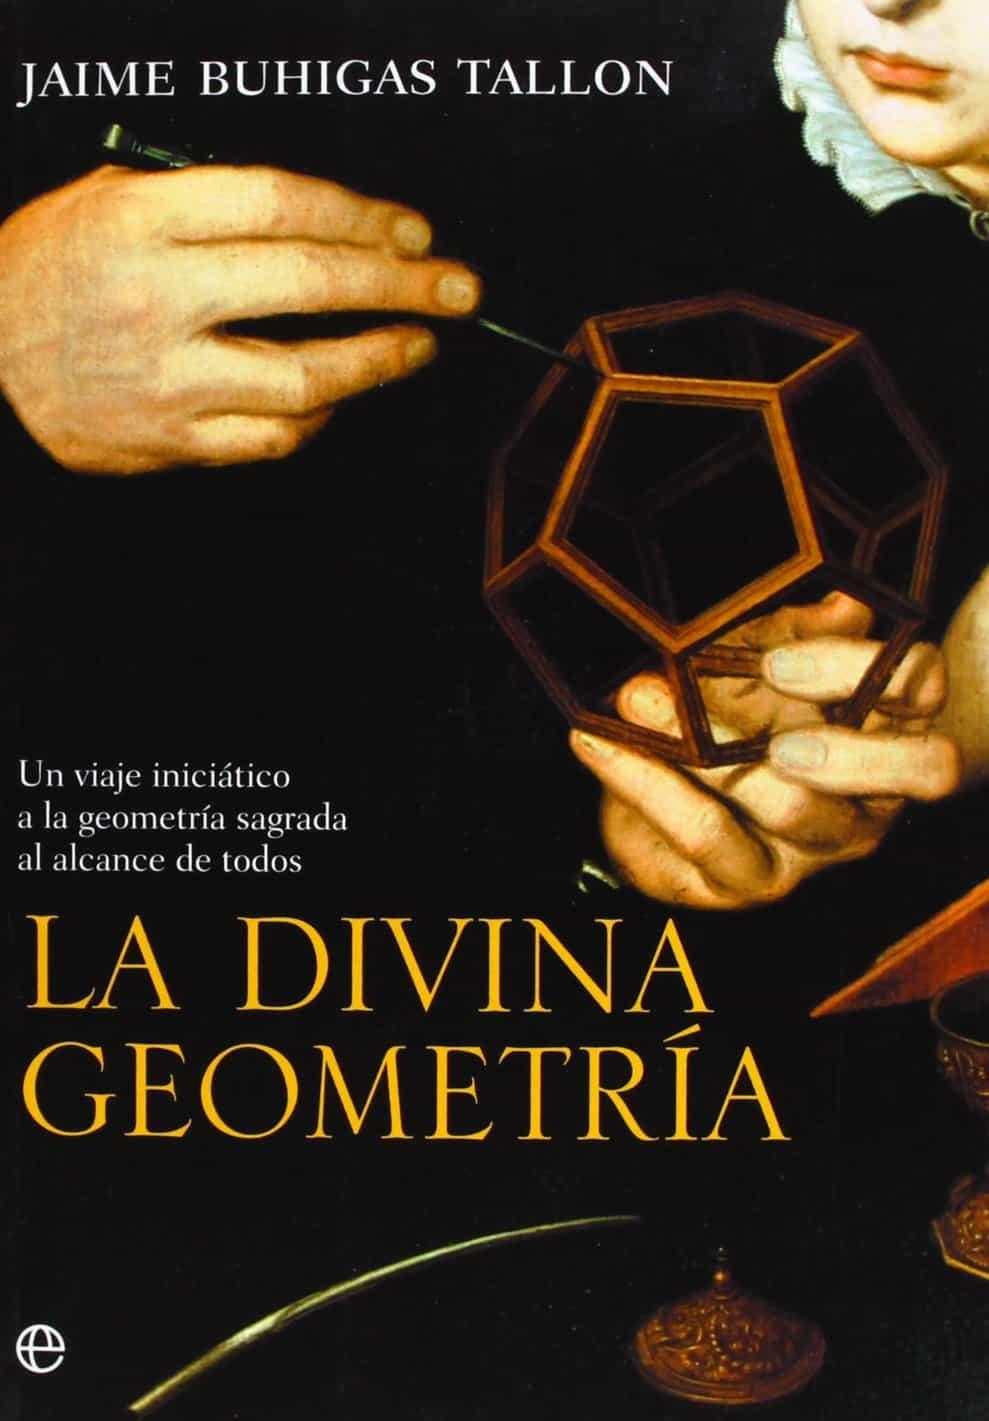 La Divina Geometria: Un Viaje Iniciatico A La Geometria Sagrada A L Alcance De Todos por Jaime Buhigas Tallon